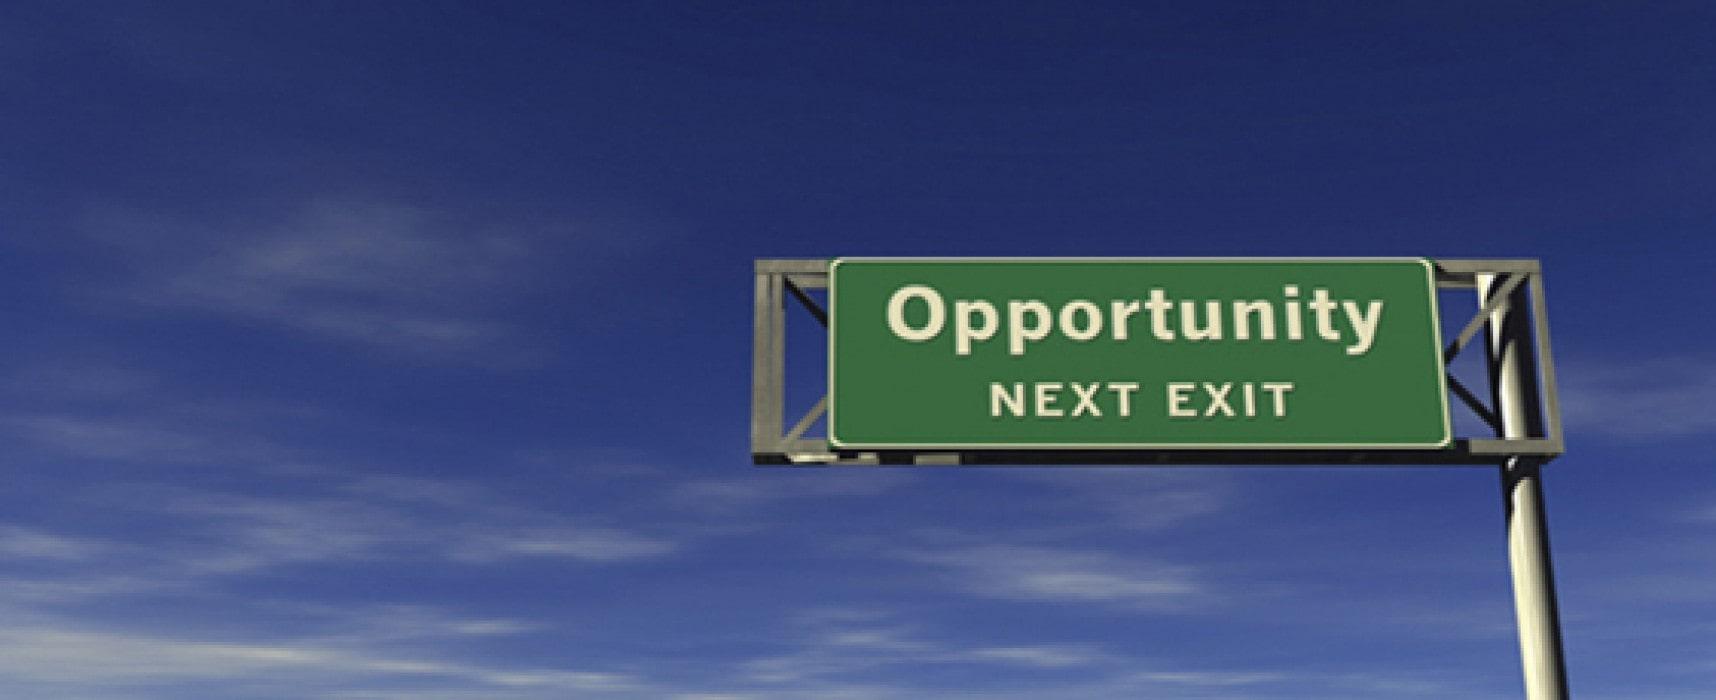 Make the best use of summer internship